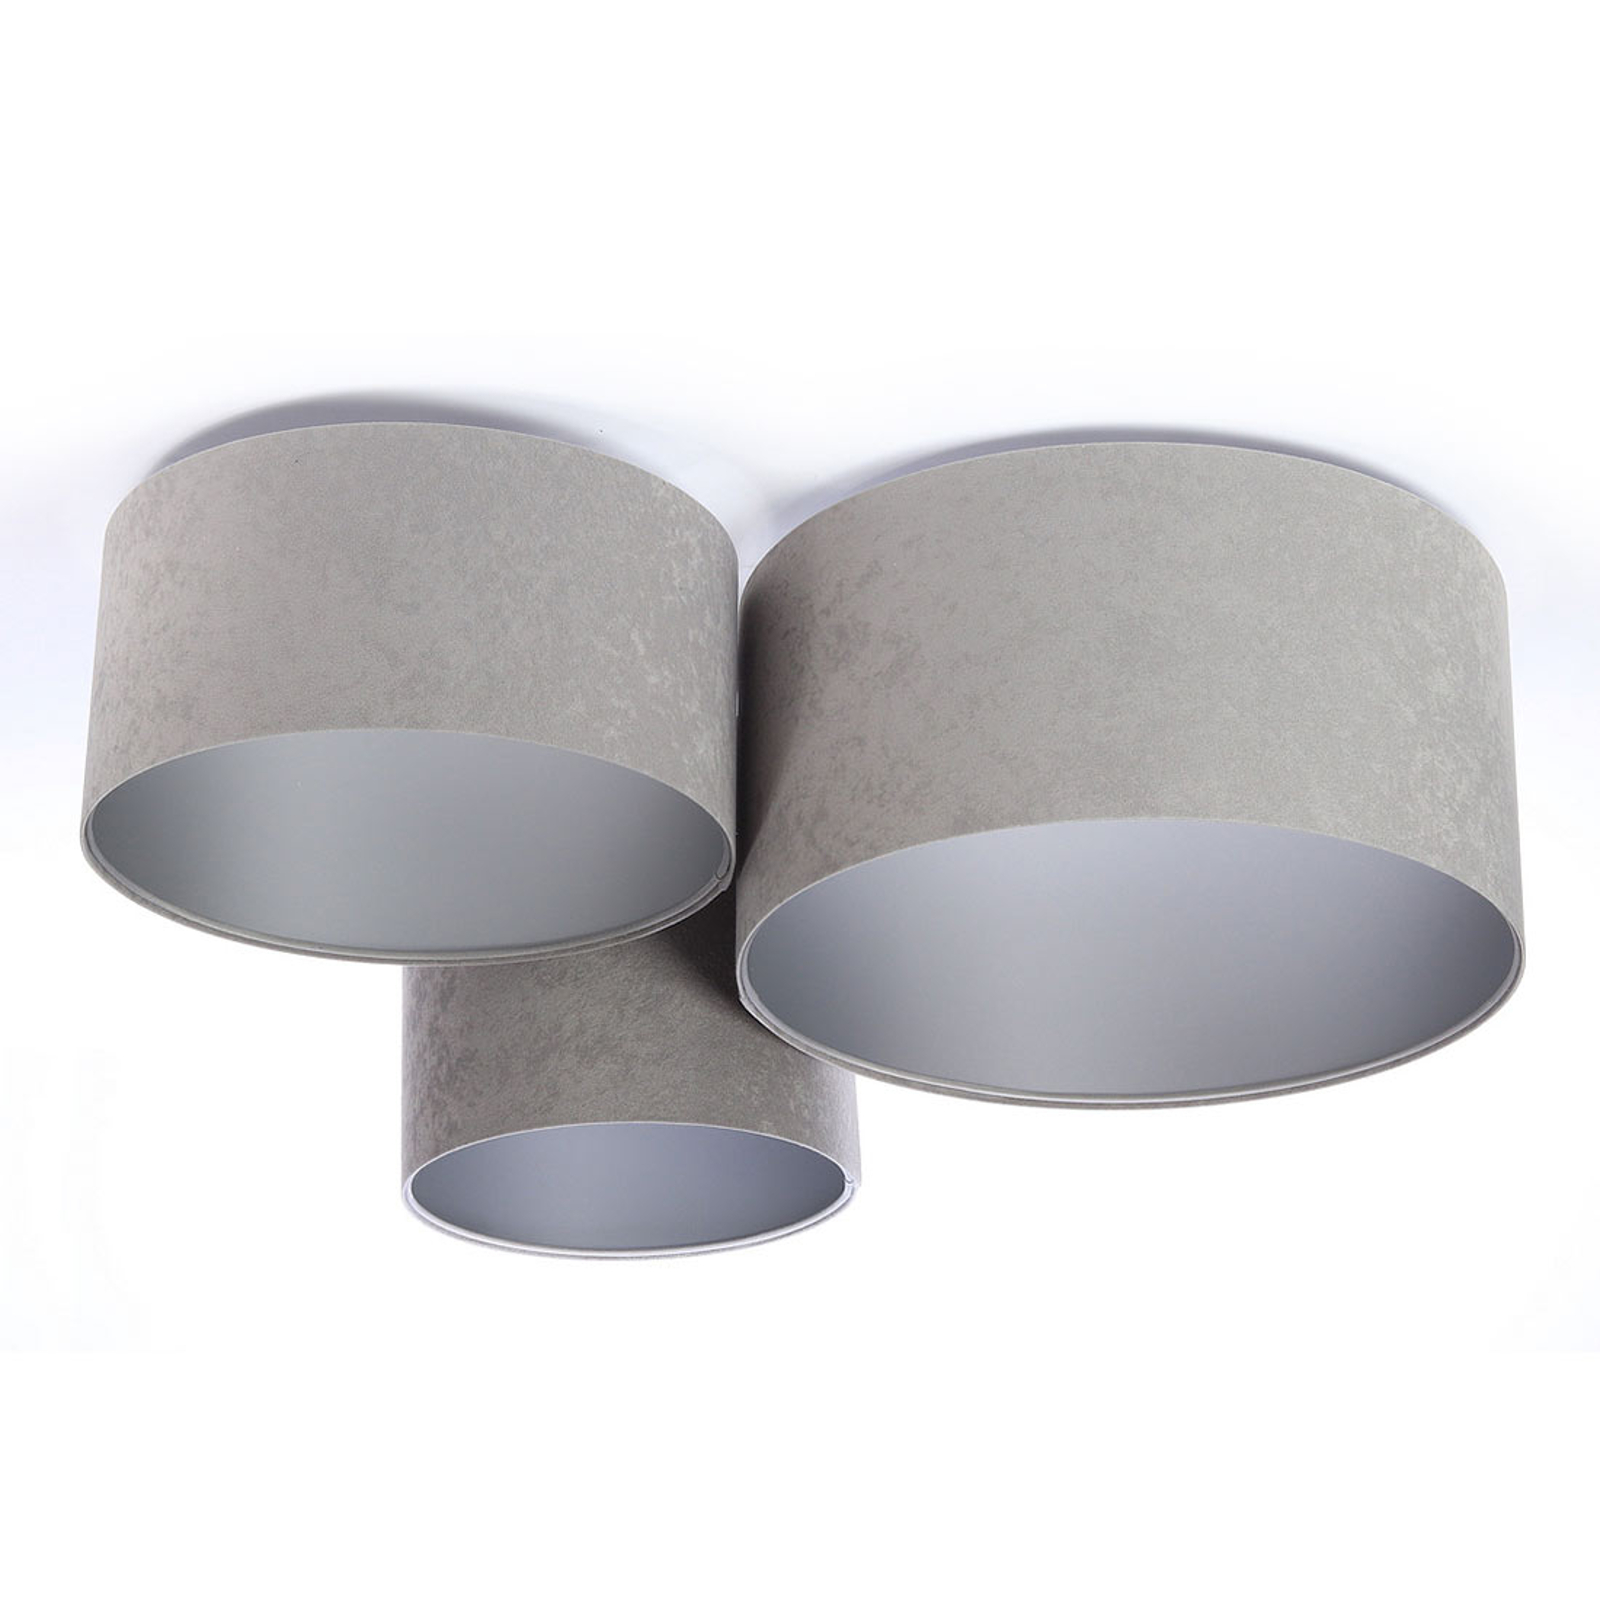 Lampa sufitowa 080, 3-punktowa, jasnoszara-srebrna